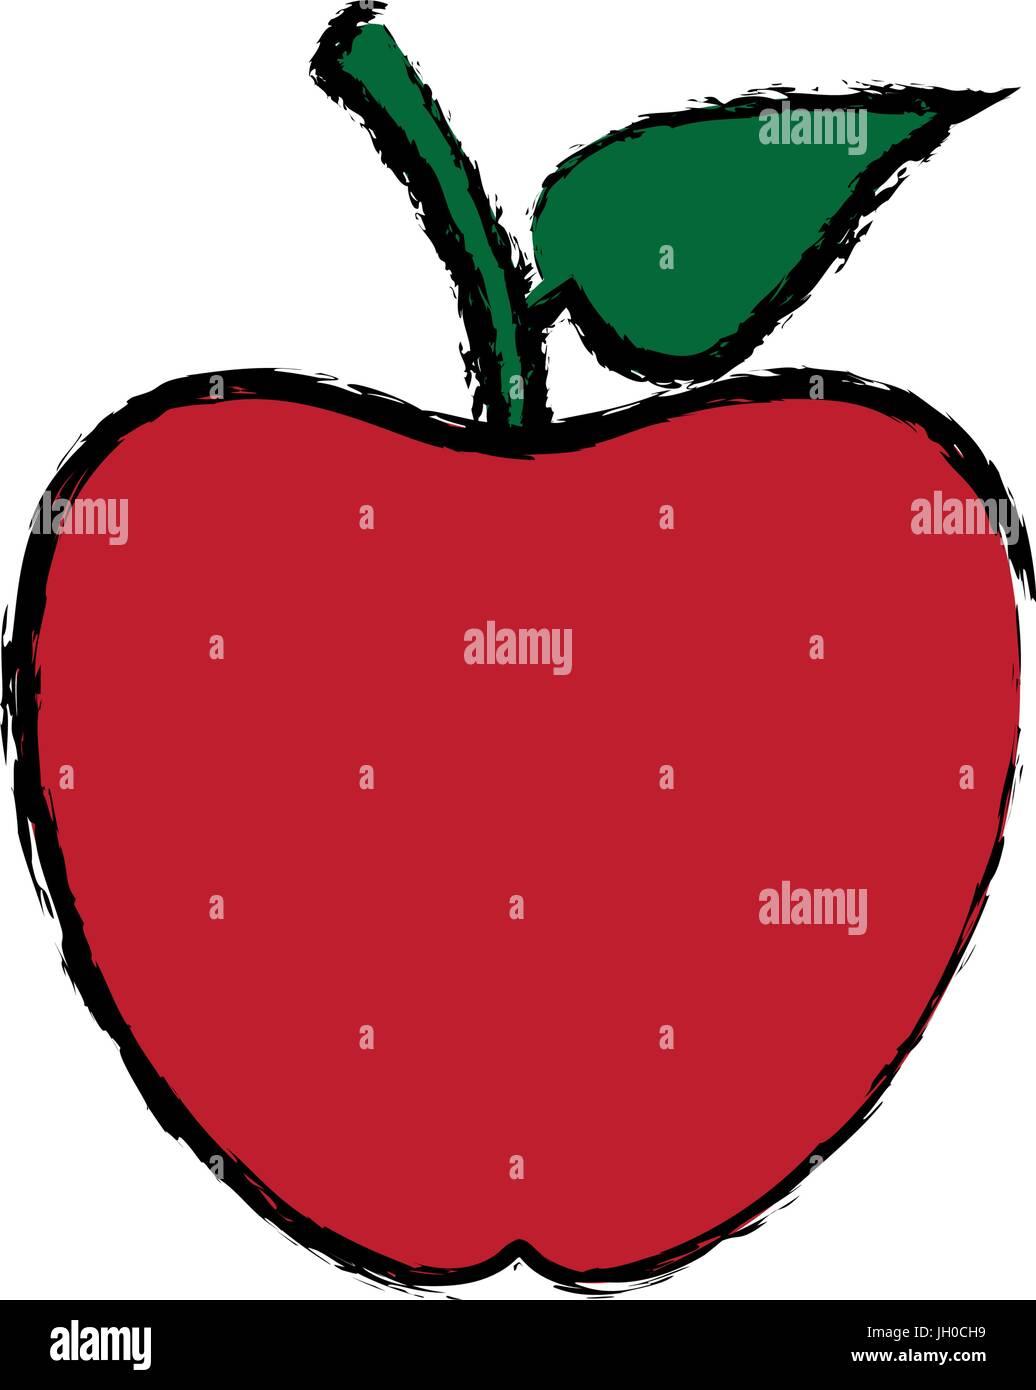 Back To School Apple Symbol Icon Stock Vector Art Illustration